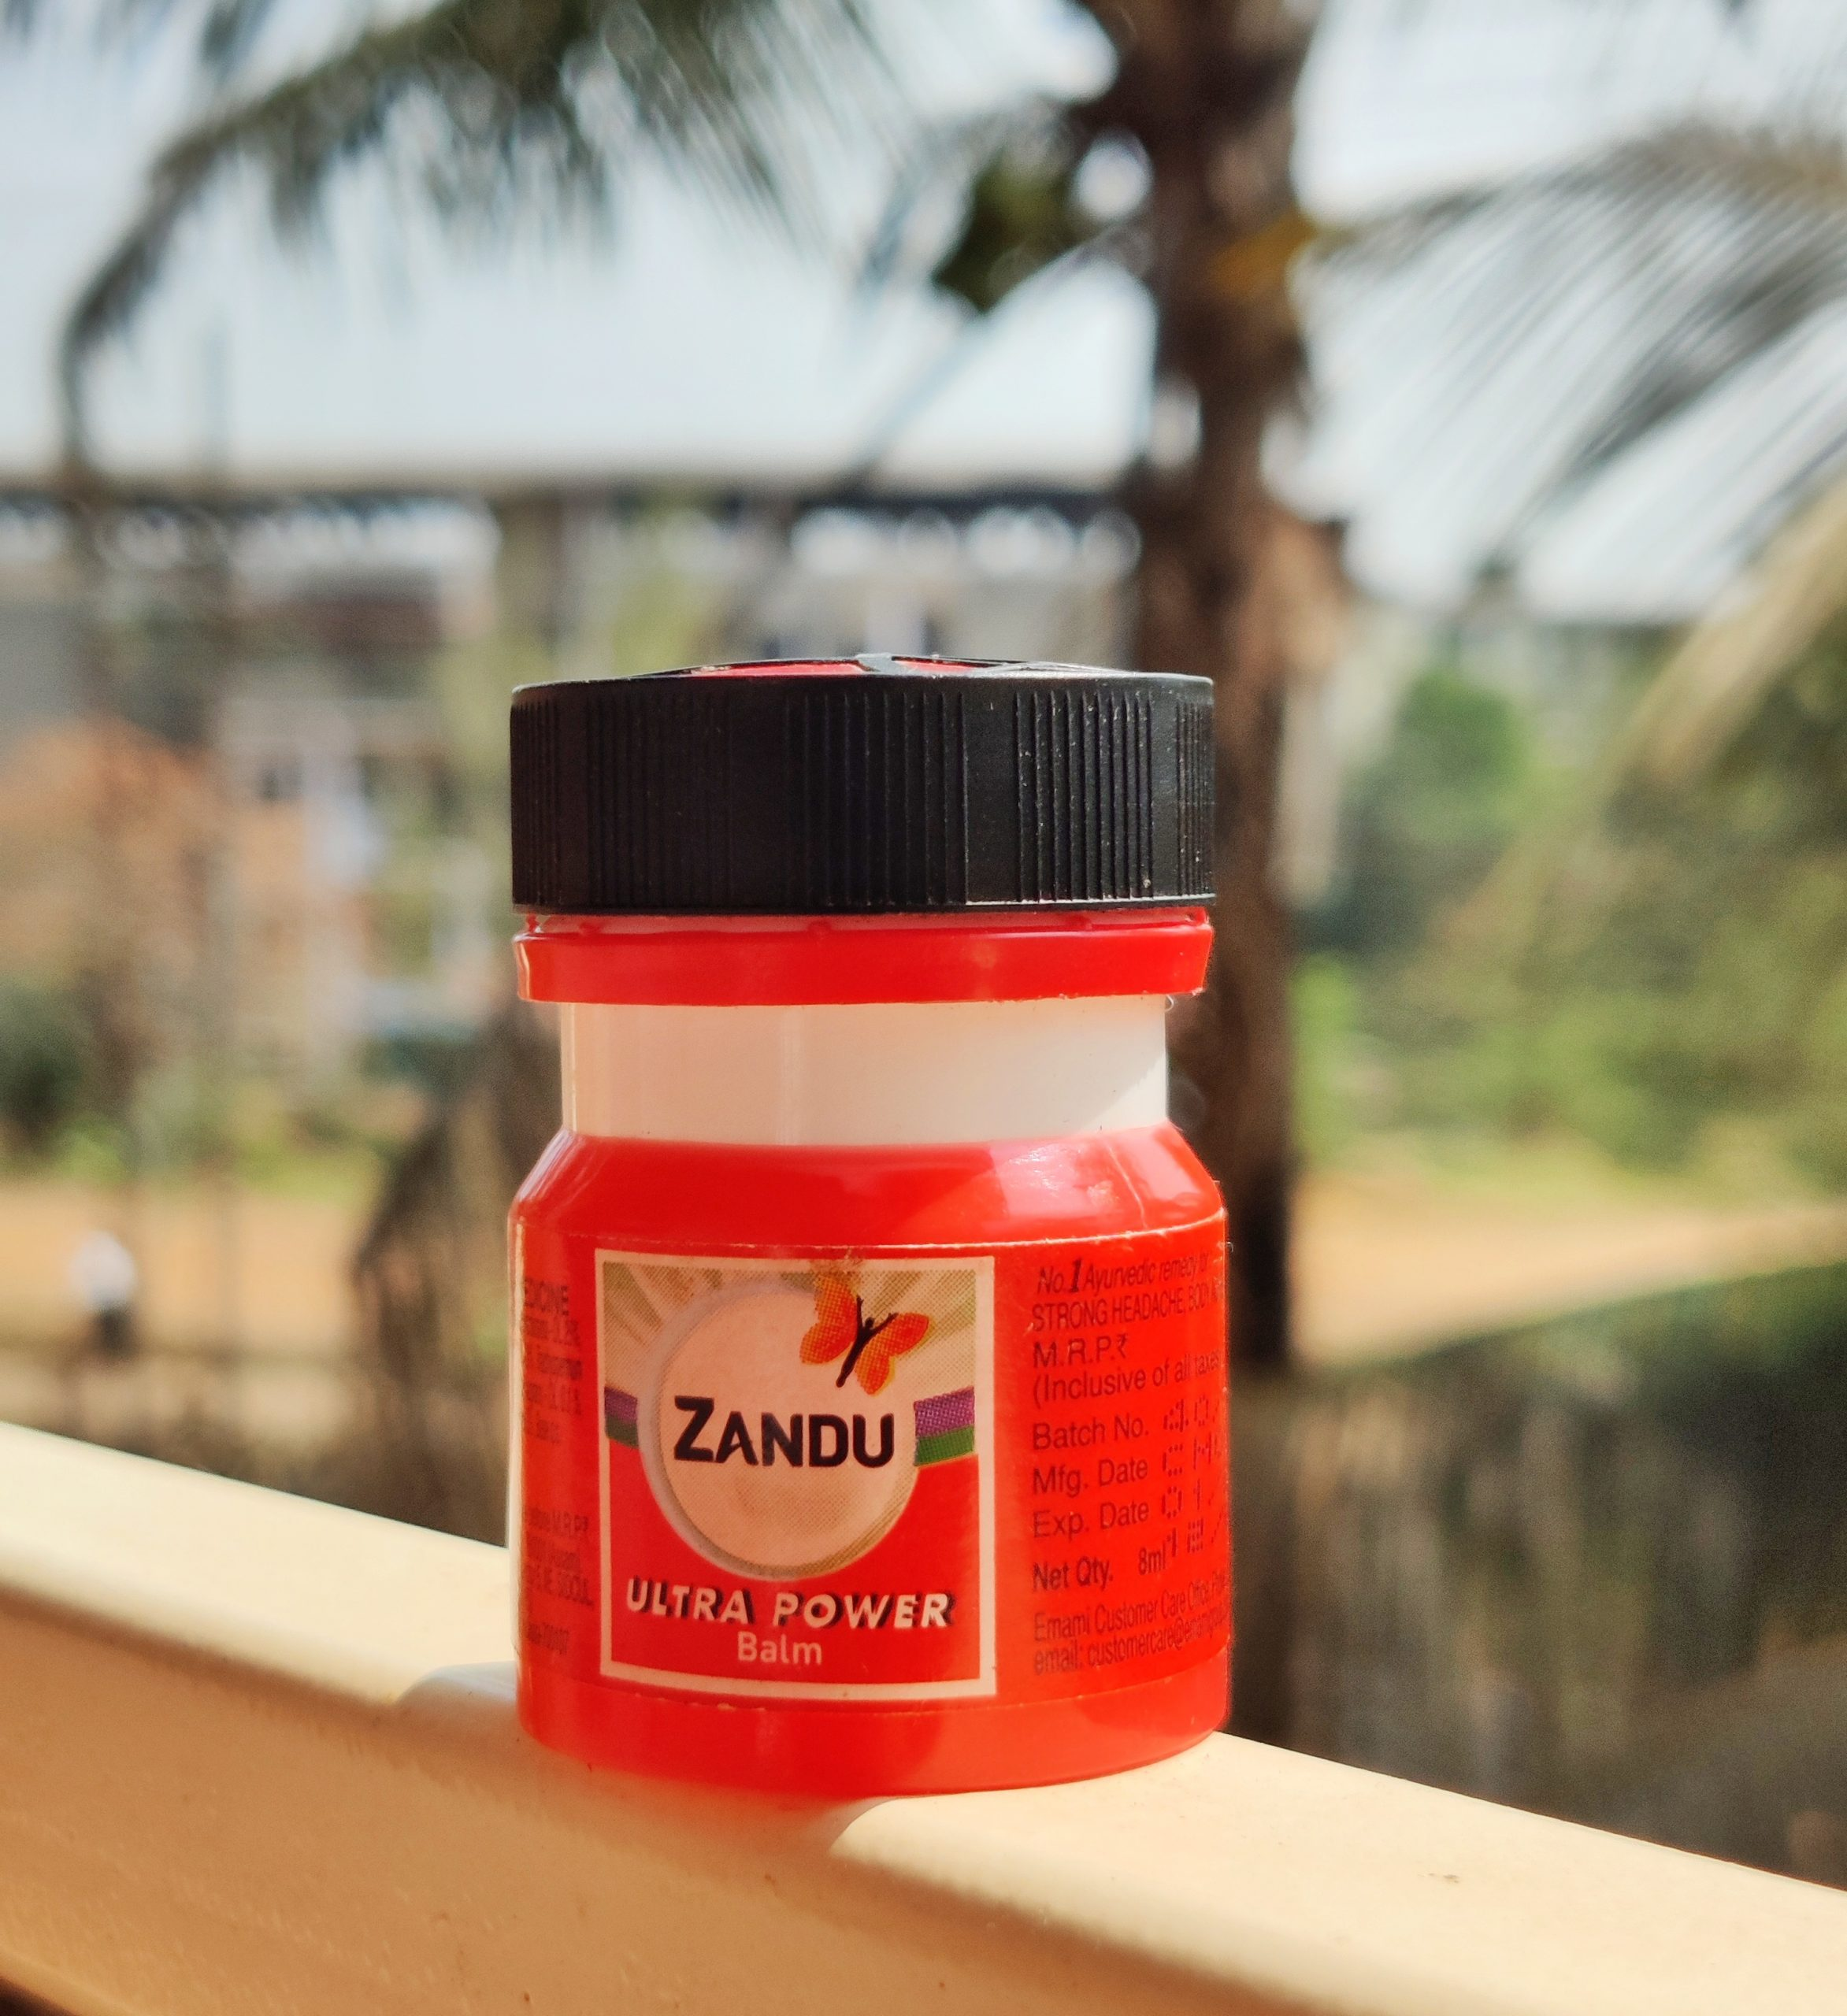 Zandu balm pain relief